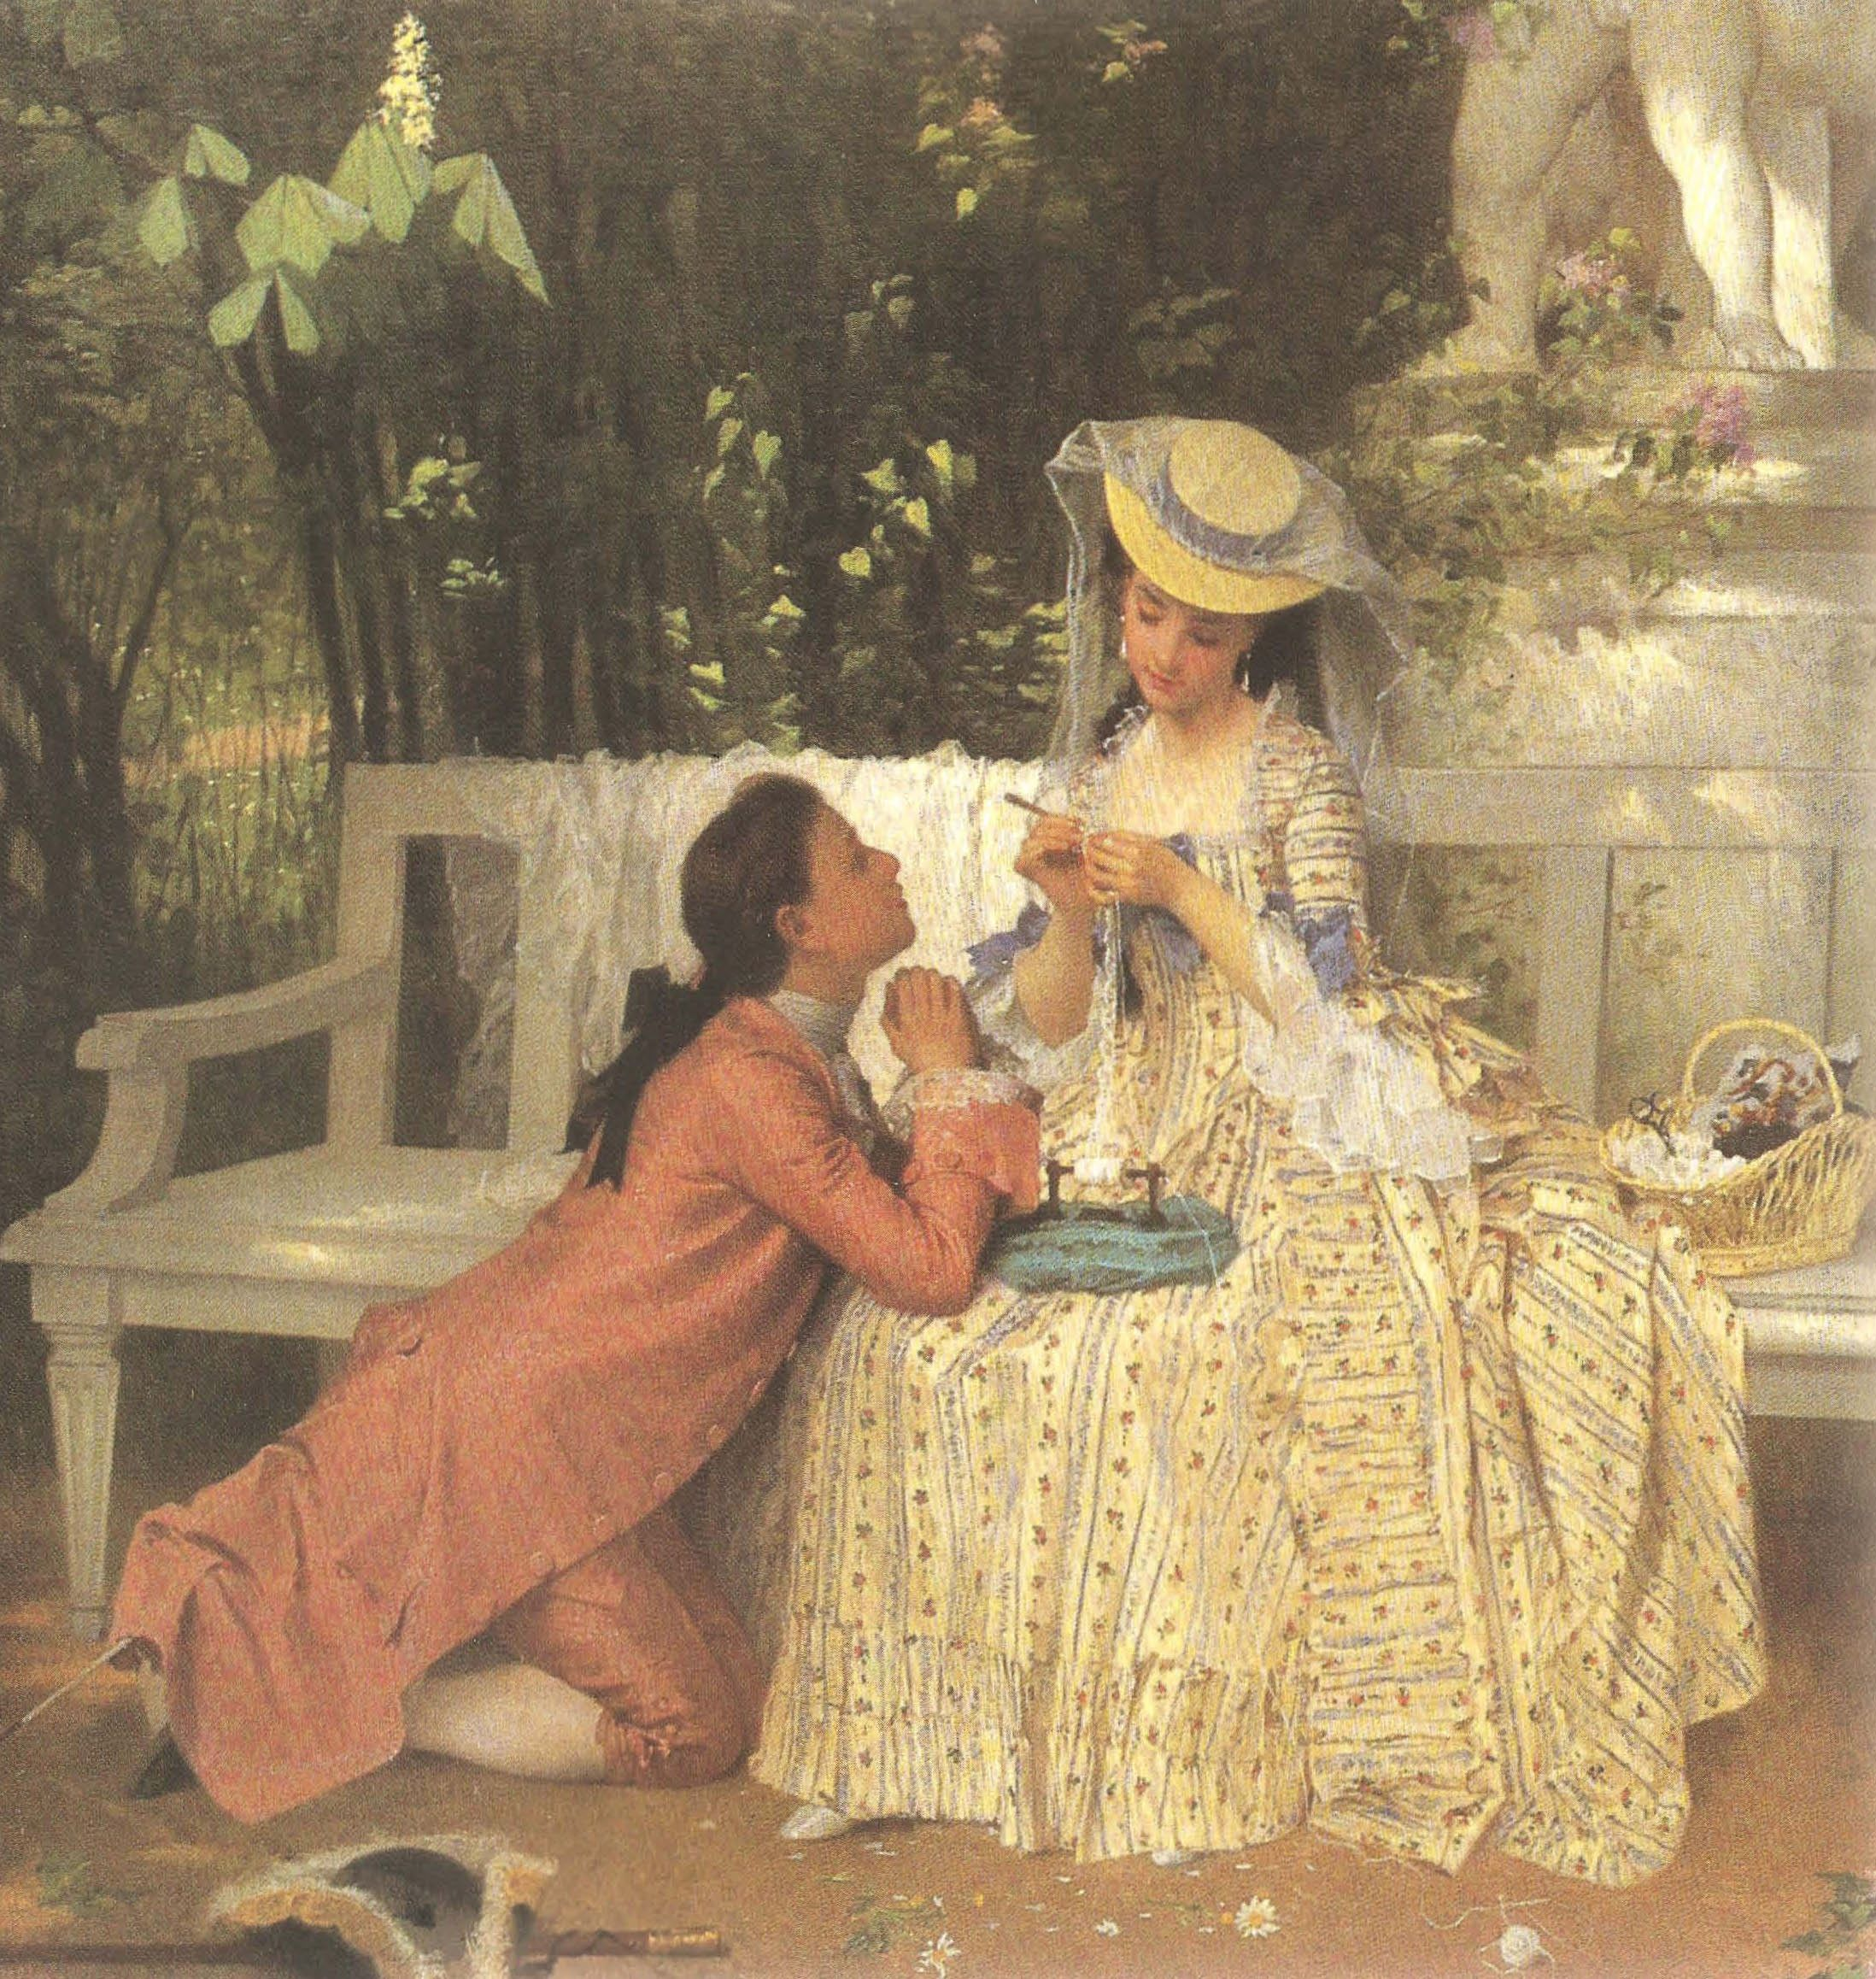 Louix XV declaring himself to Madame du Barry by Joseph Caraund